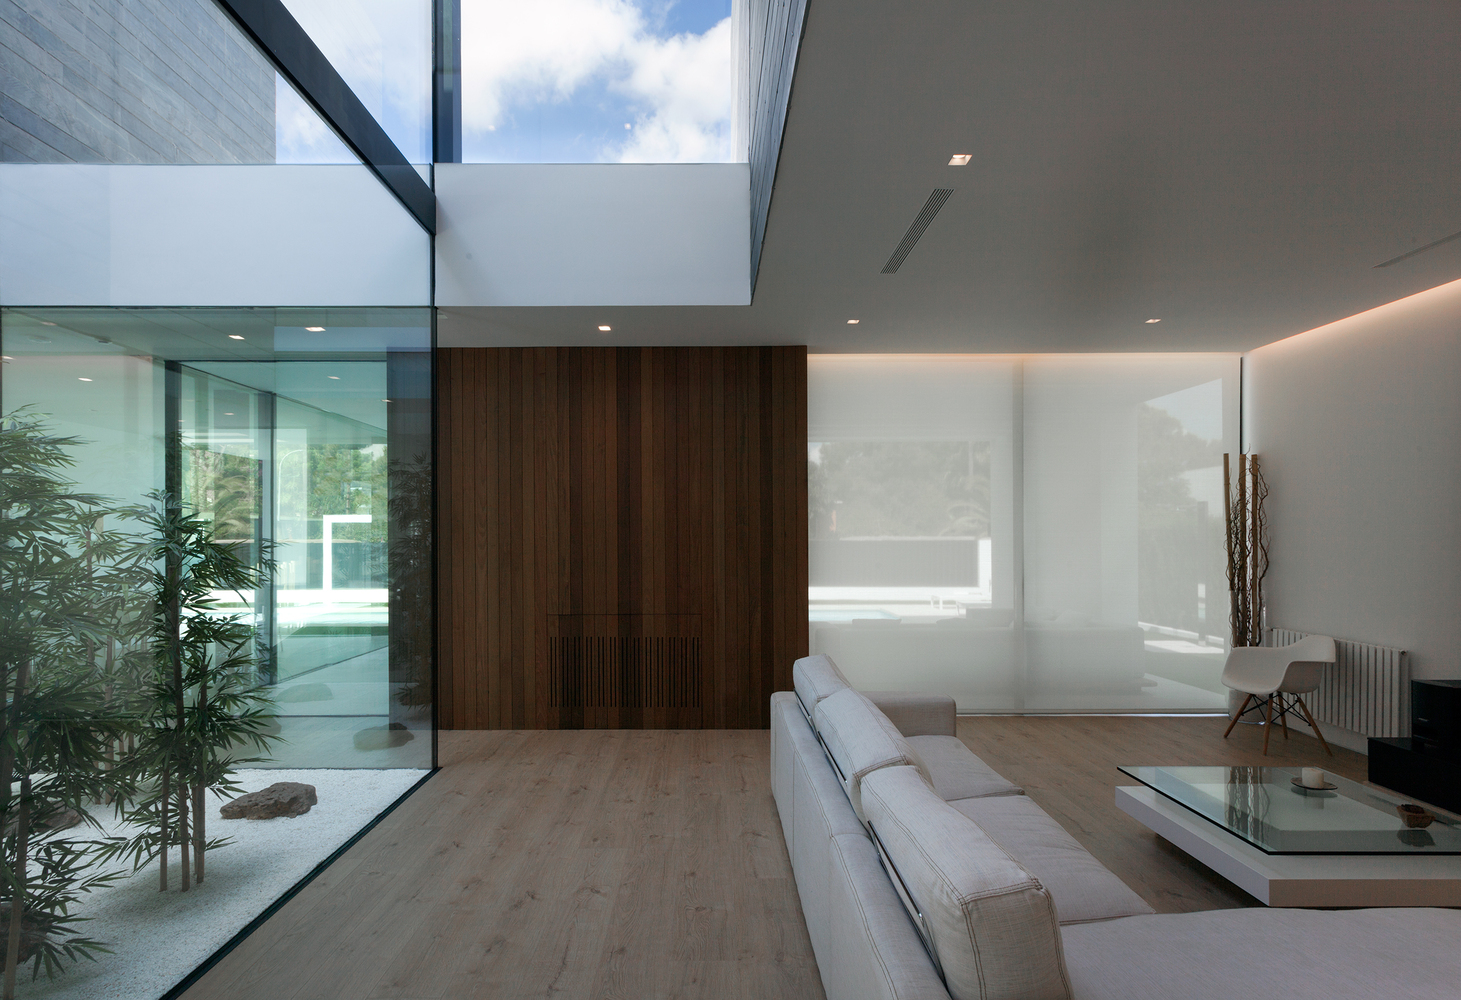 A casa tem muita luz natural